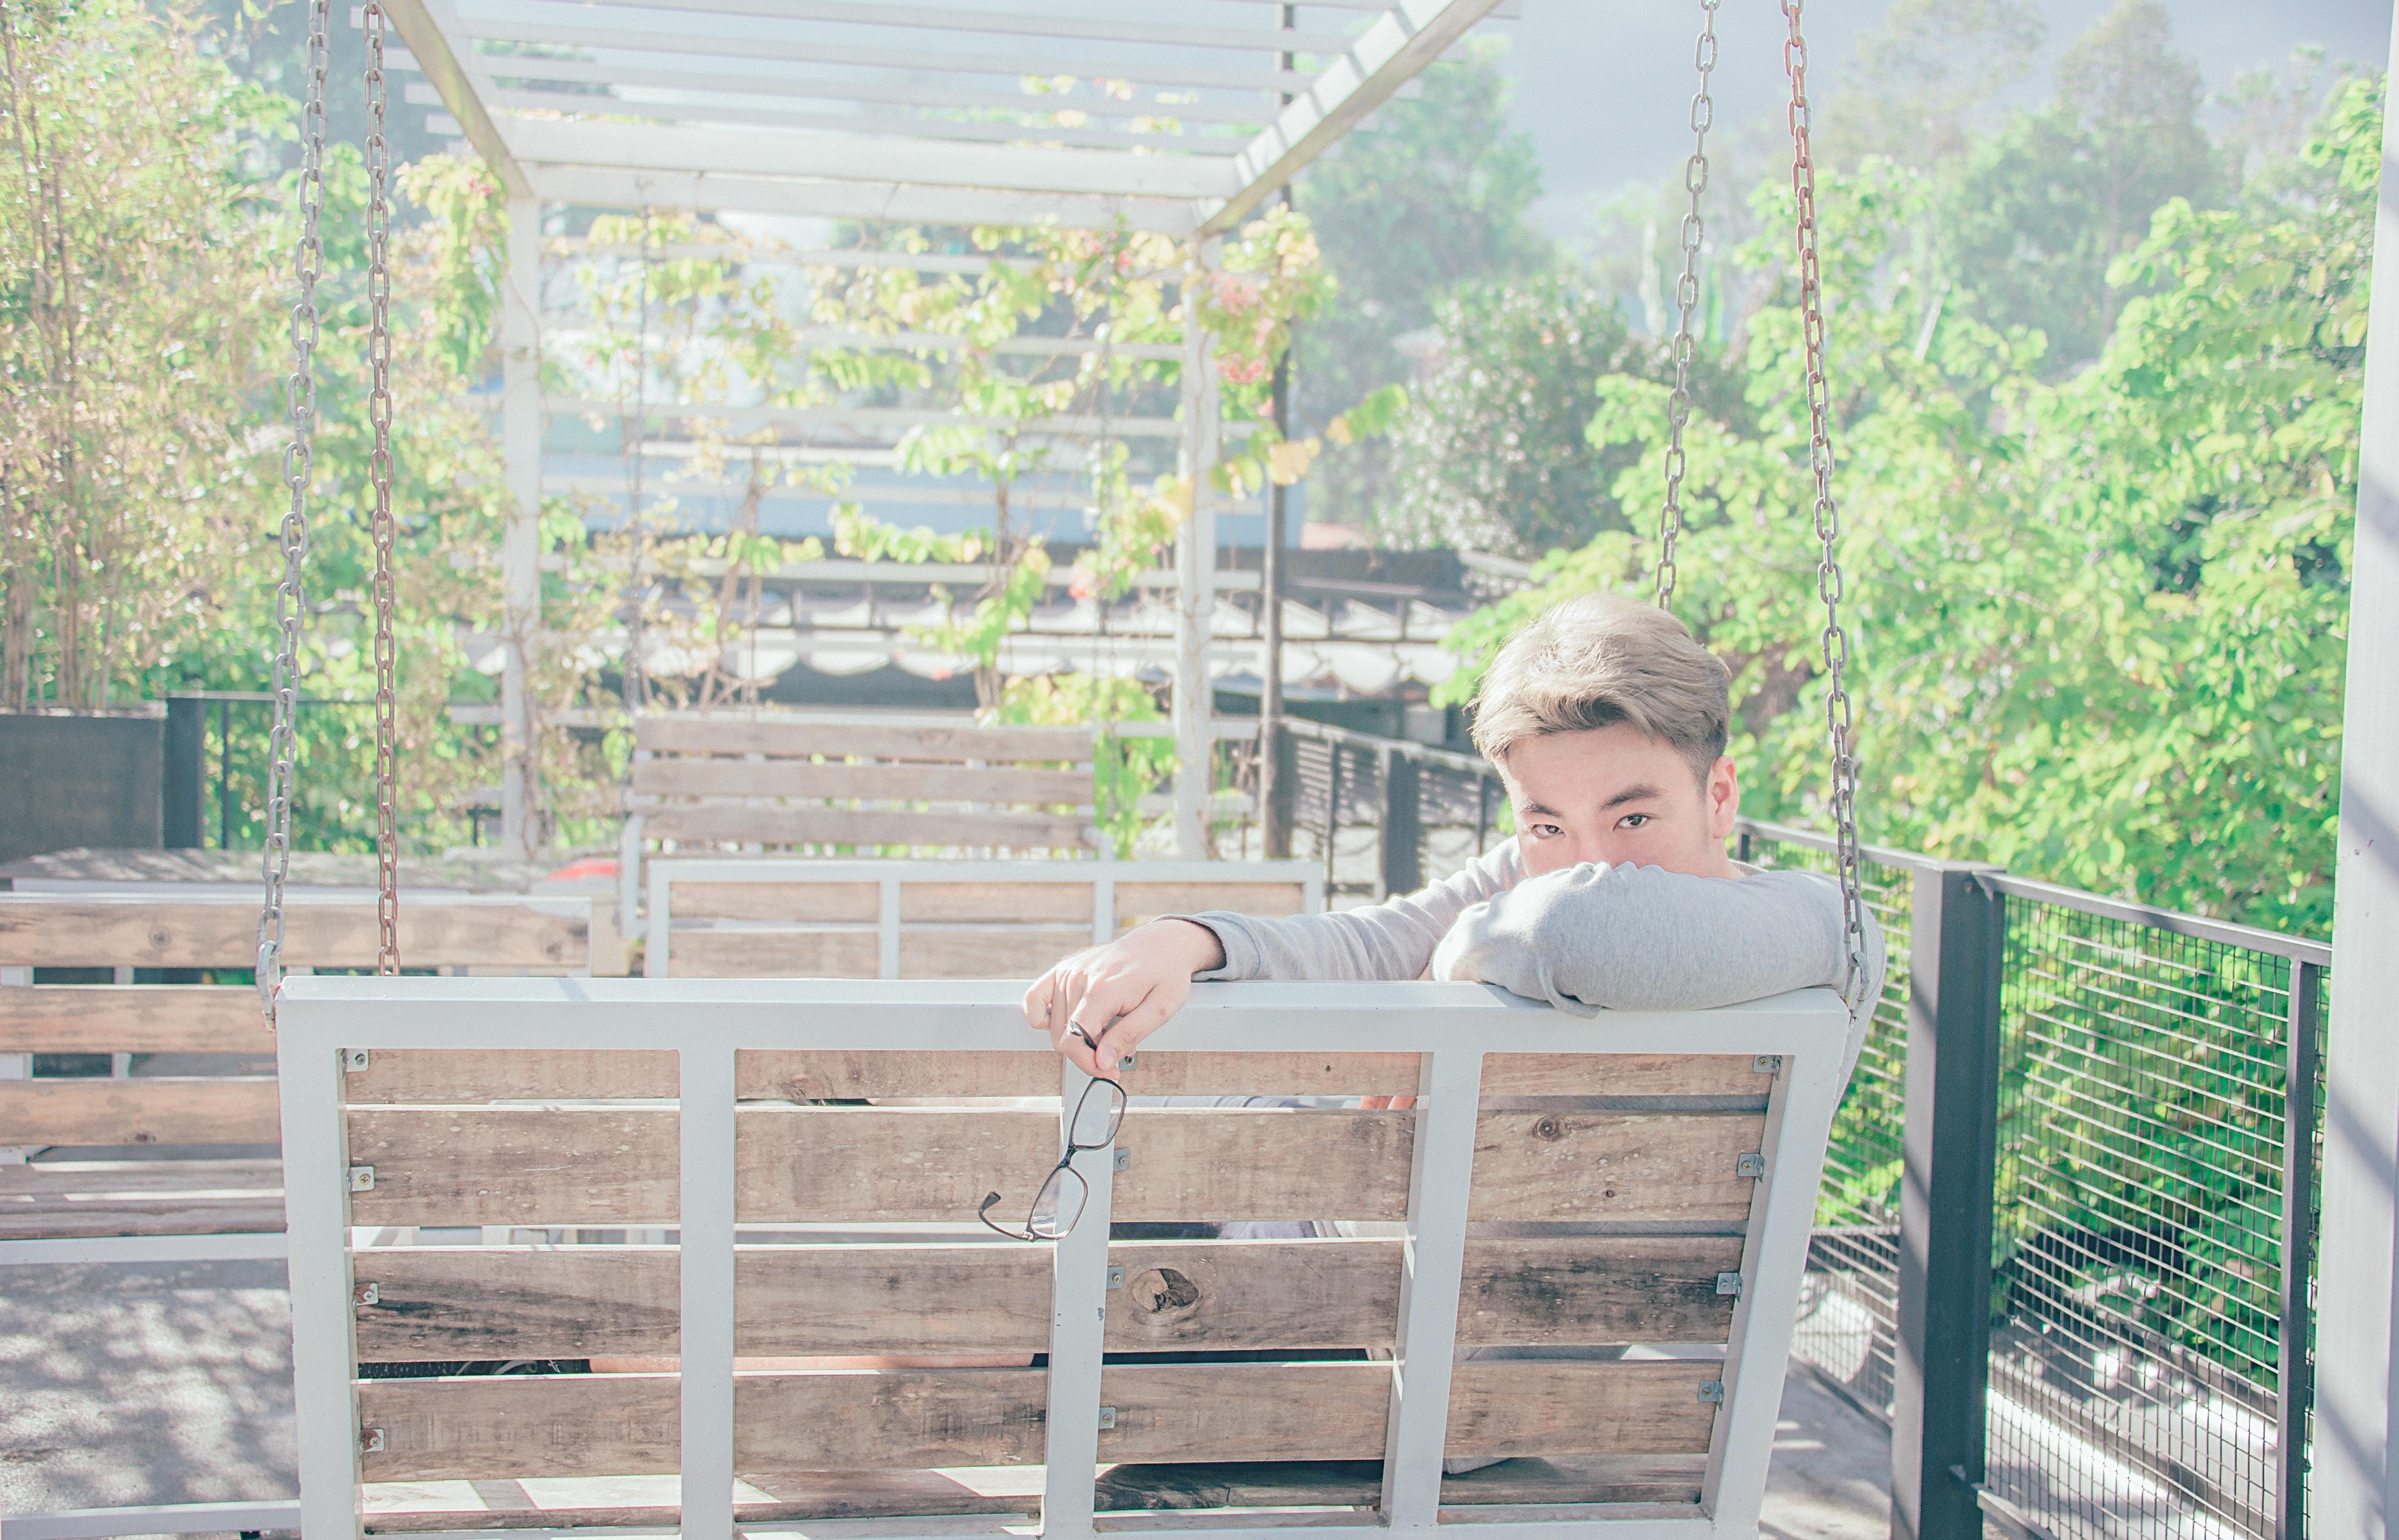 Man in Gray Shirt Sitting on Bench, Daylight, Environment, Eyewear, Fence, HQ Photo